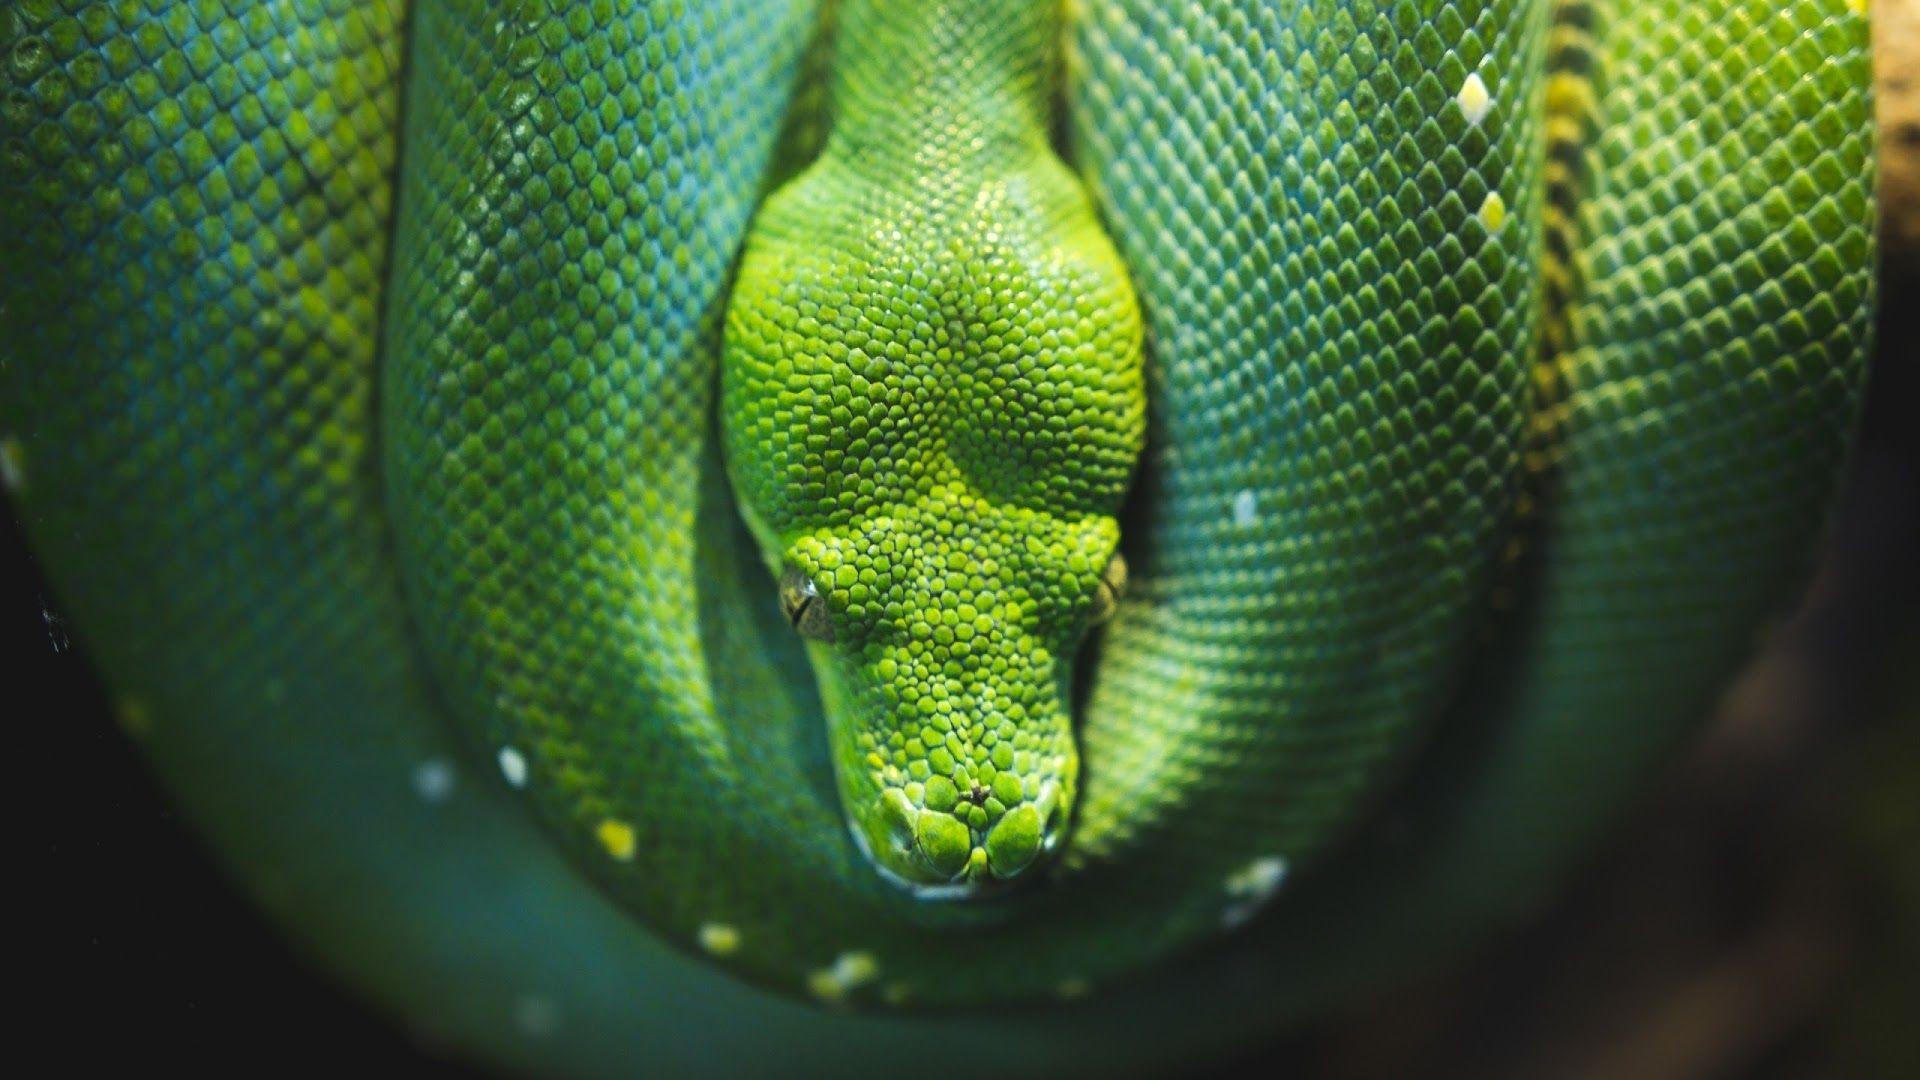 Snake Green Tree Python Wallpapers 4k Hd Desktop